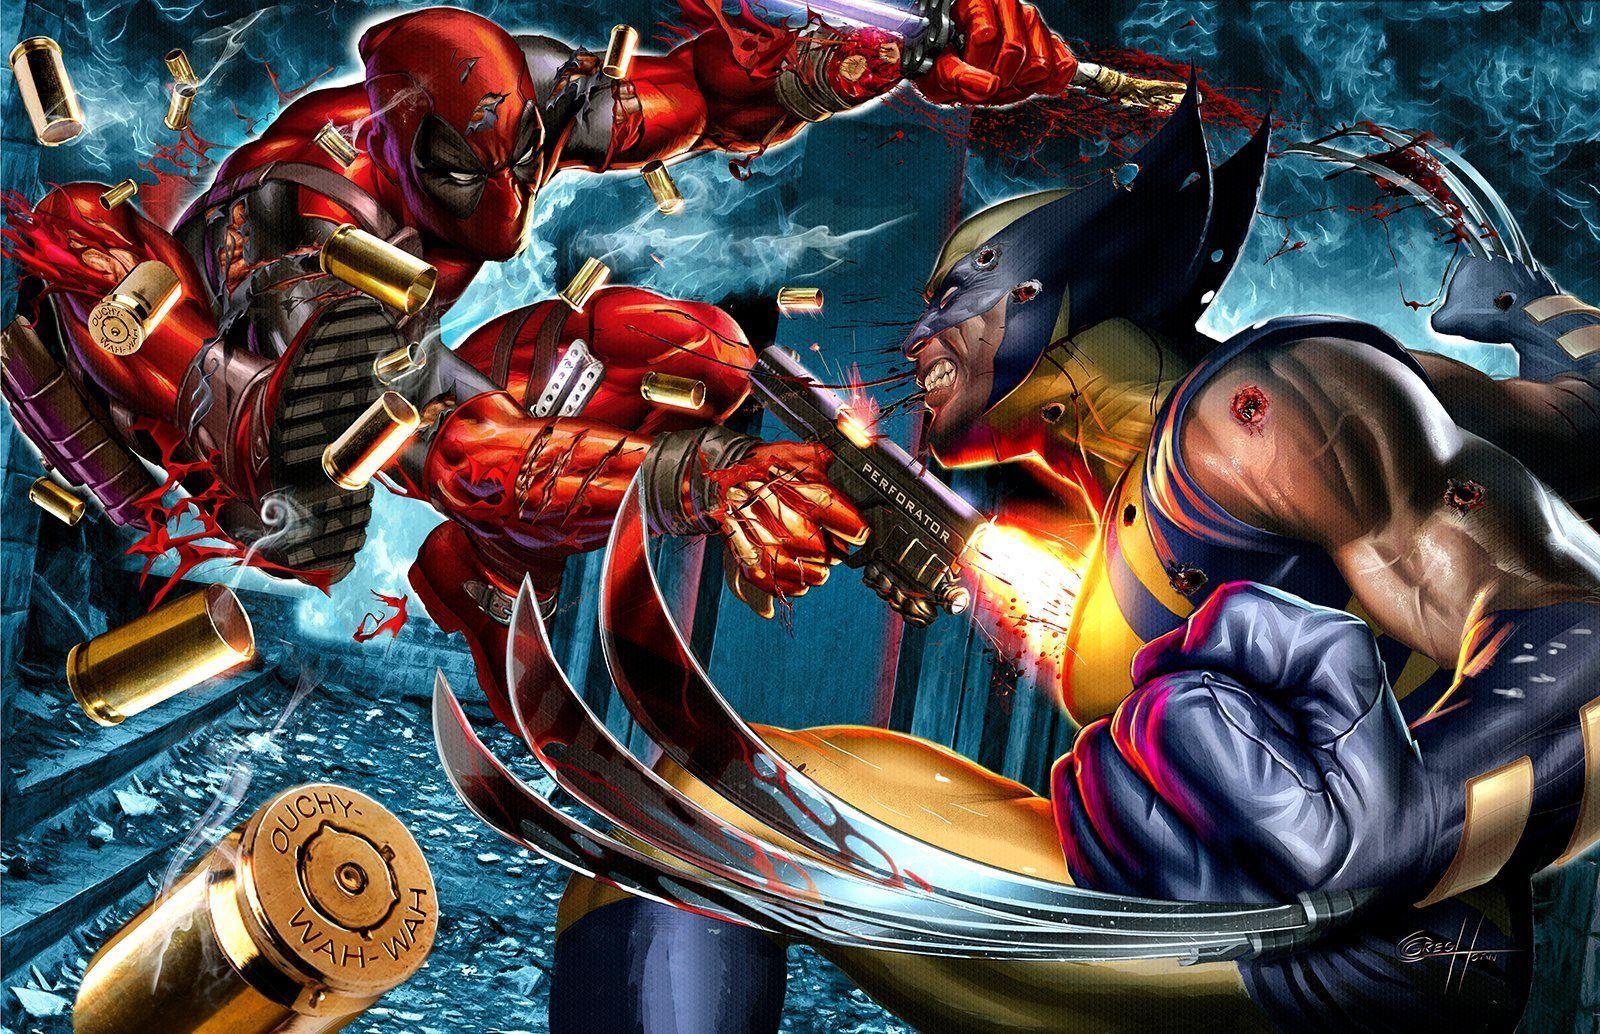 Wolverine Vs Deadpool 24 X 36 Poster Signed Wolverine Movie Marvel Comics Art Deadpool